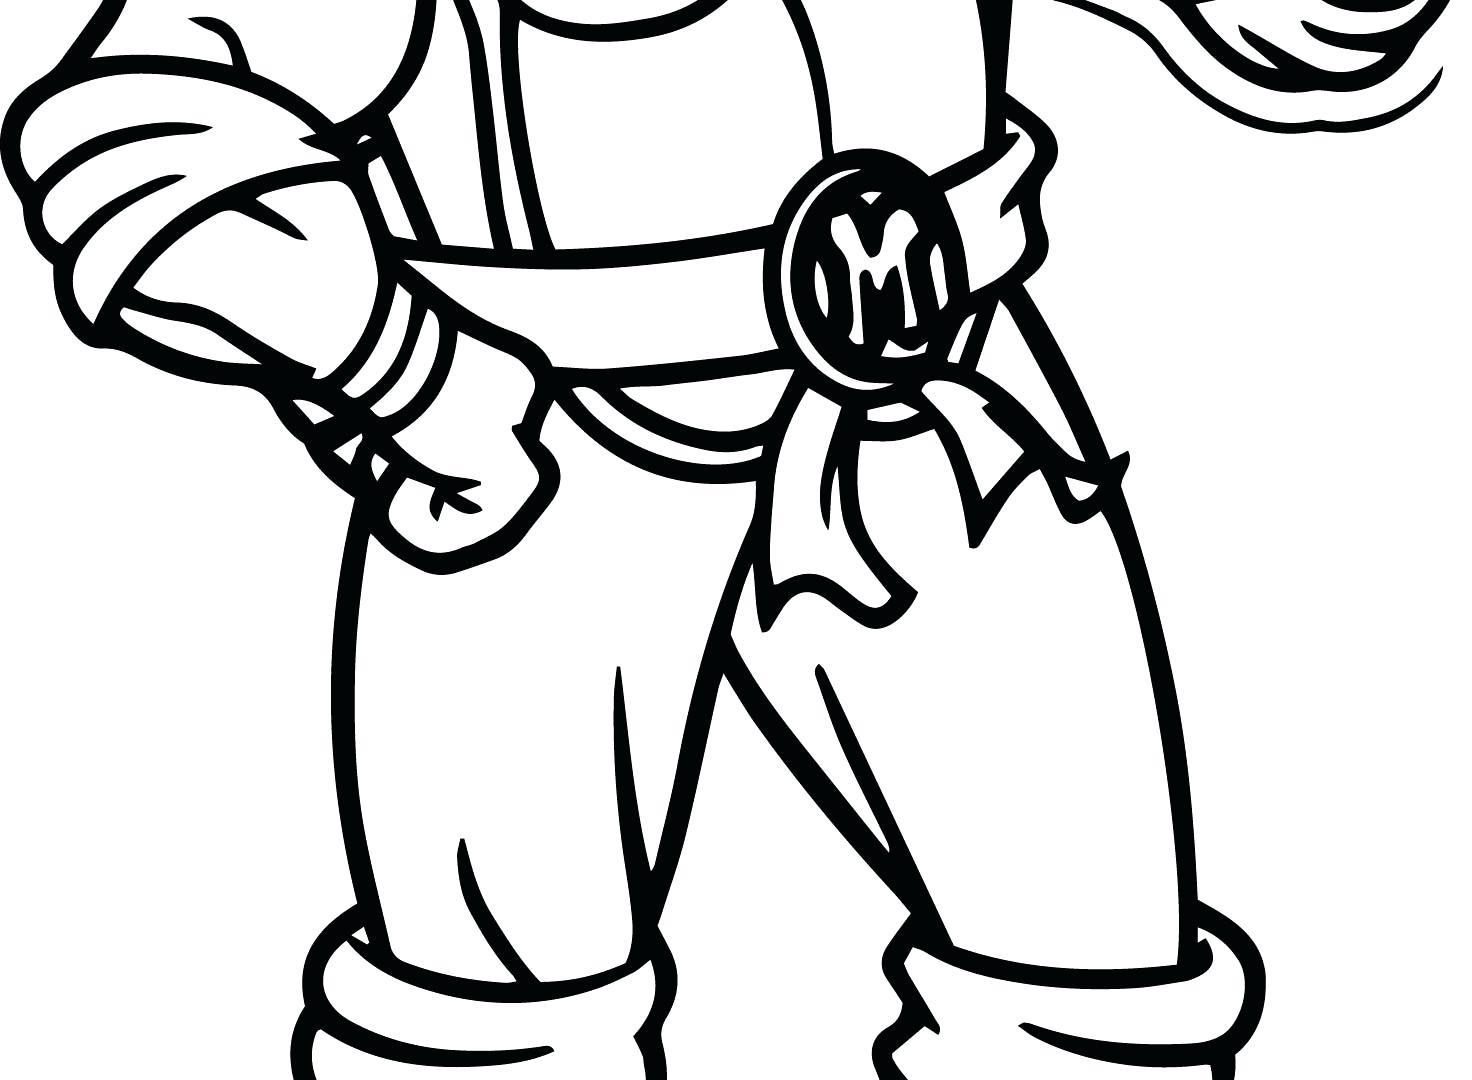 1472x1080 Teenage Mutant Ninja Turtles Coloring Pages Donatello Printable